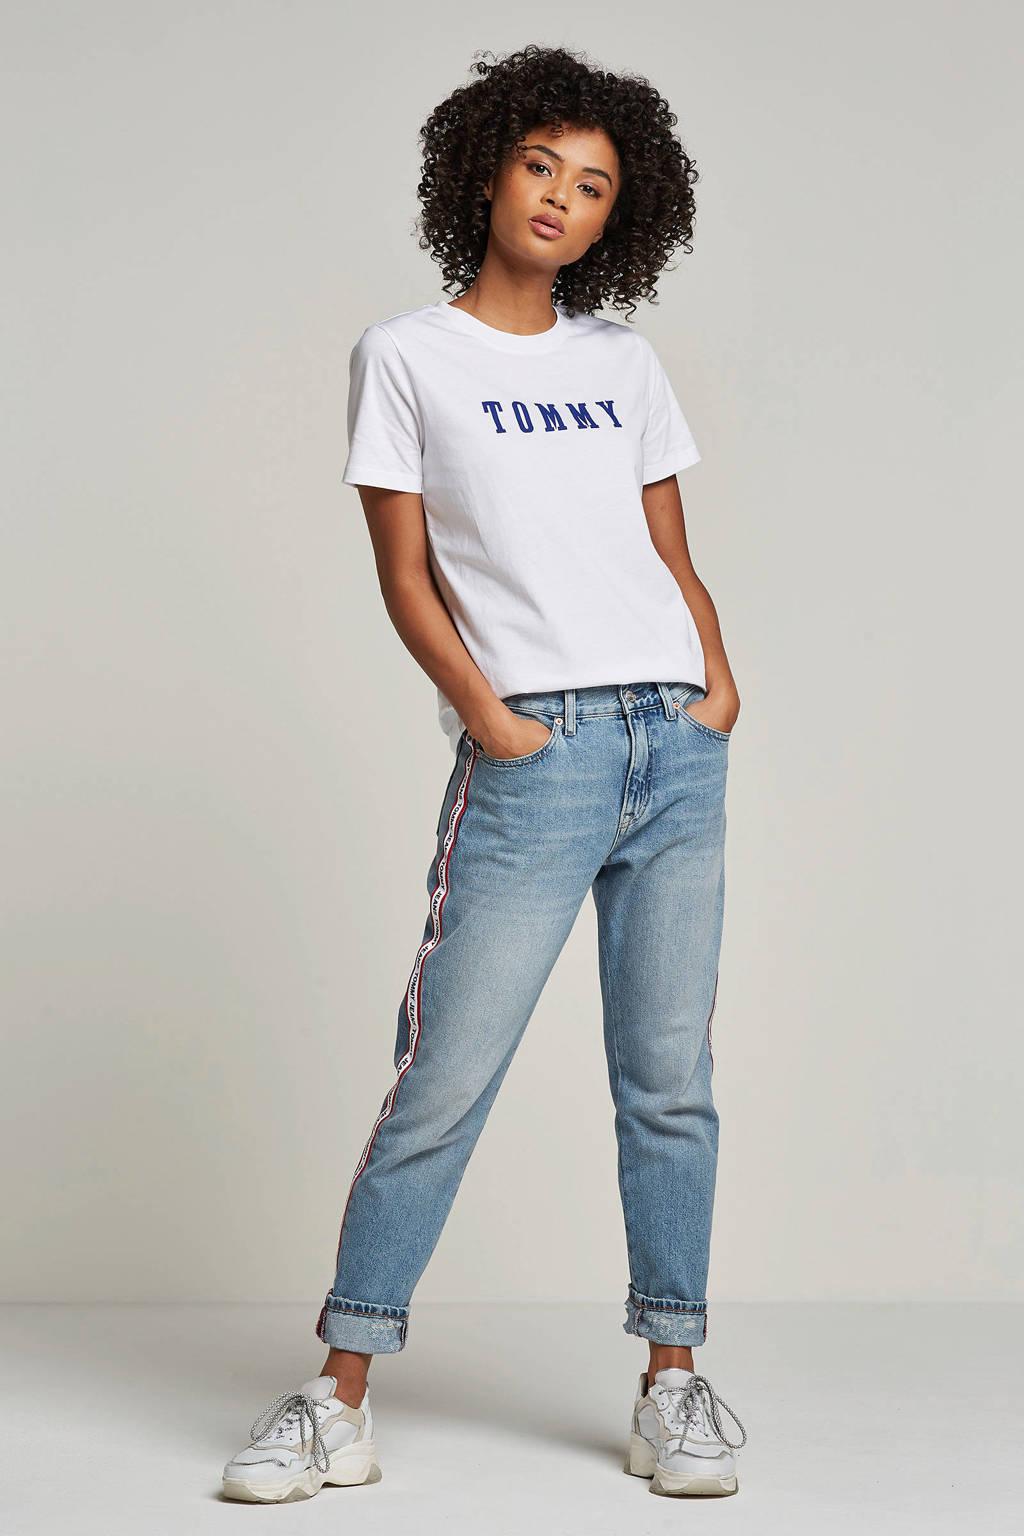 Tommy Hilfiger T-shirt Holli met logo opdruk, Wit